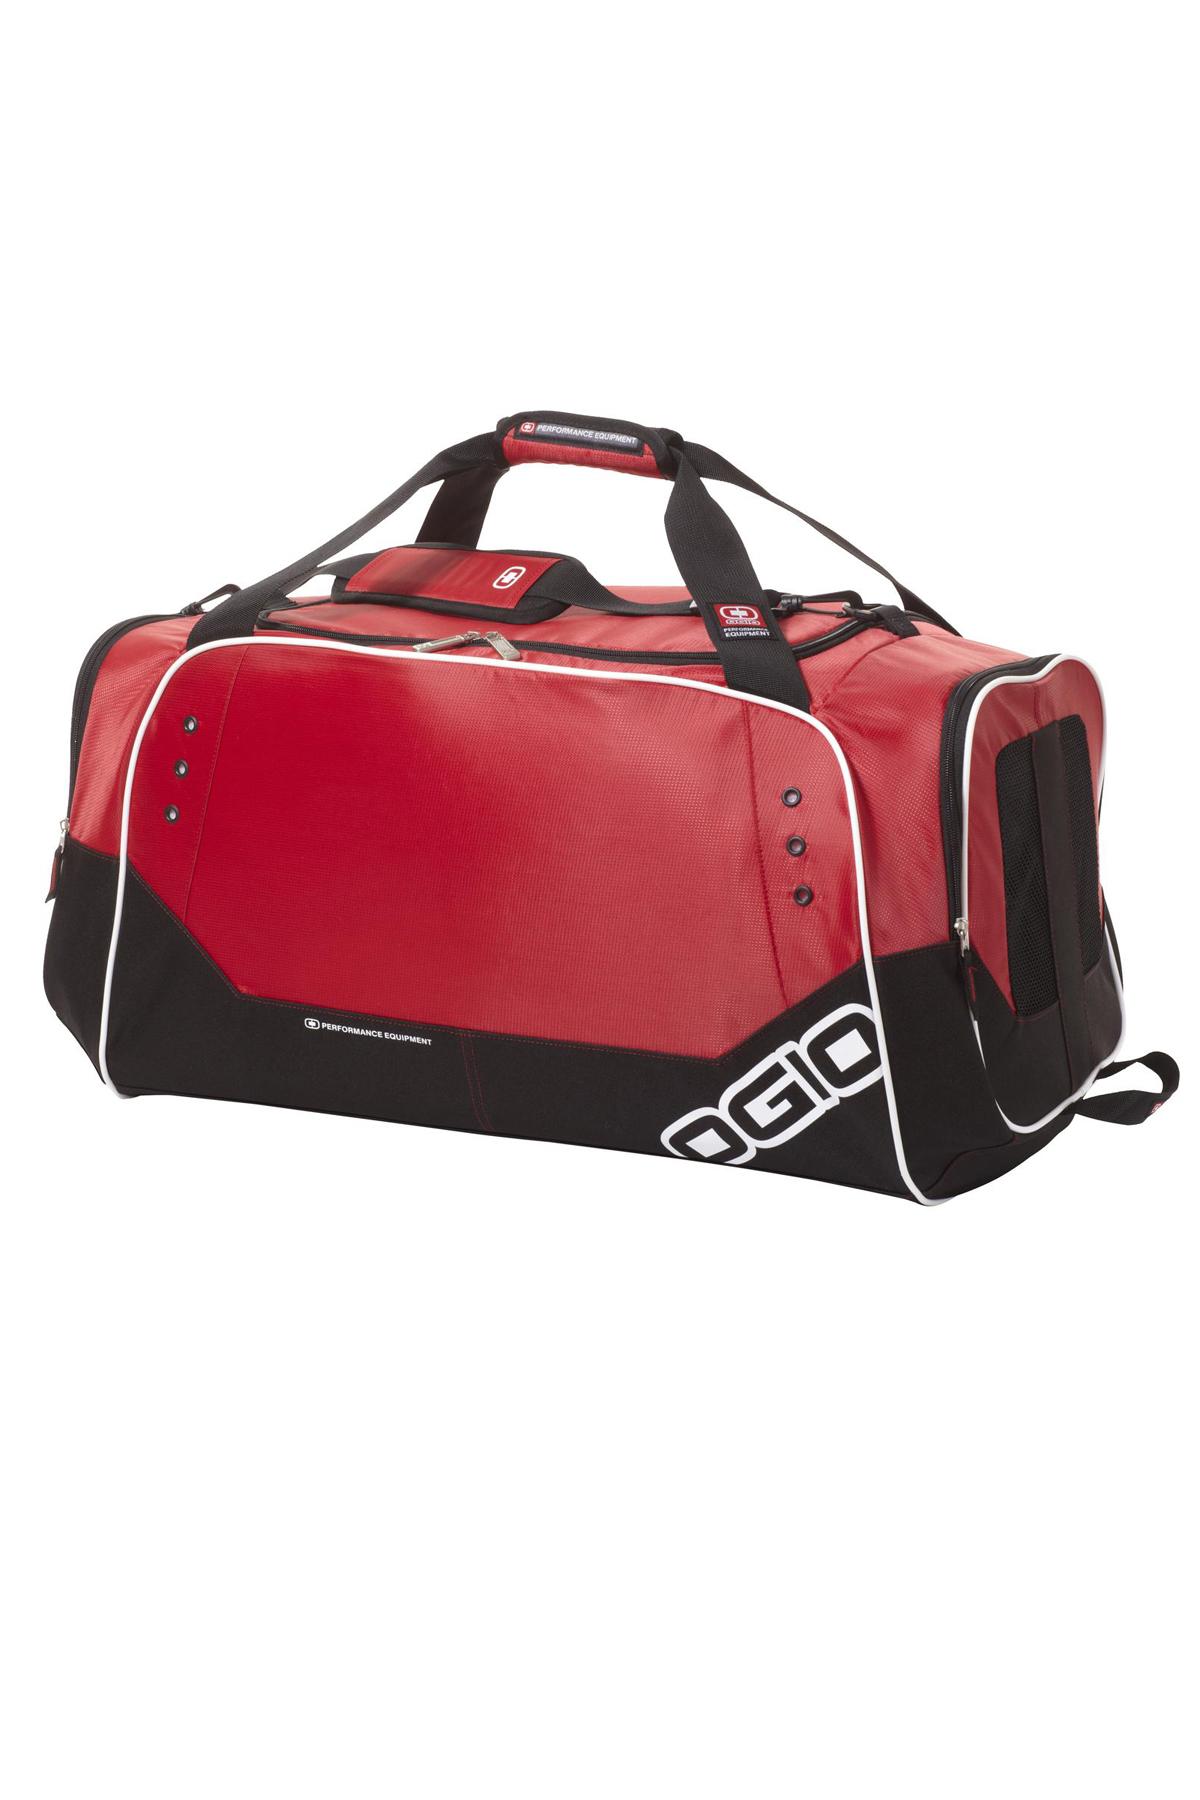 Bags-Duffels-18